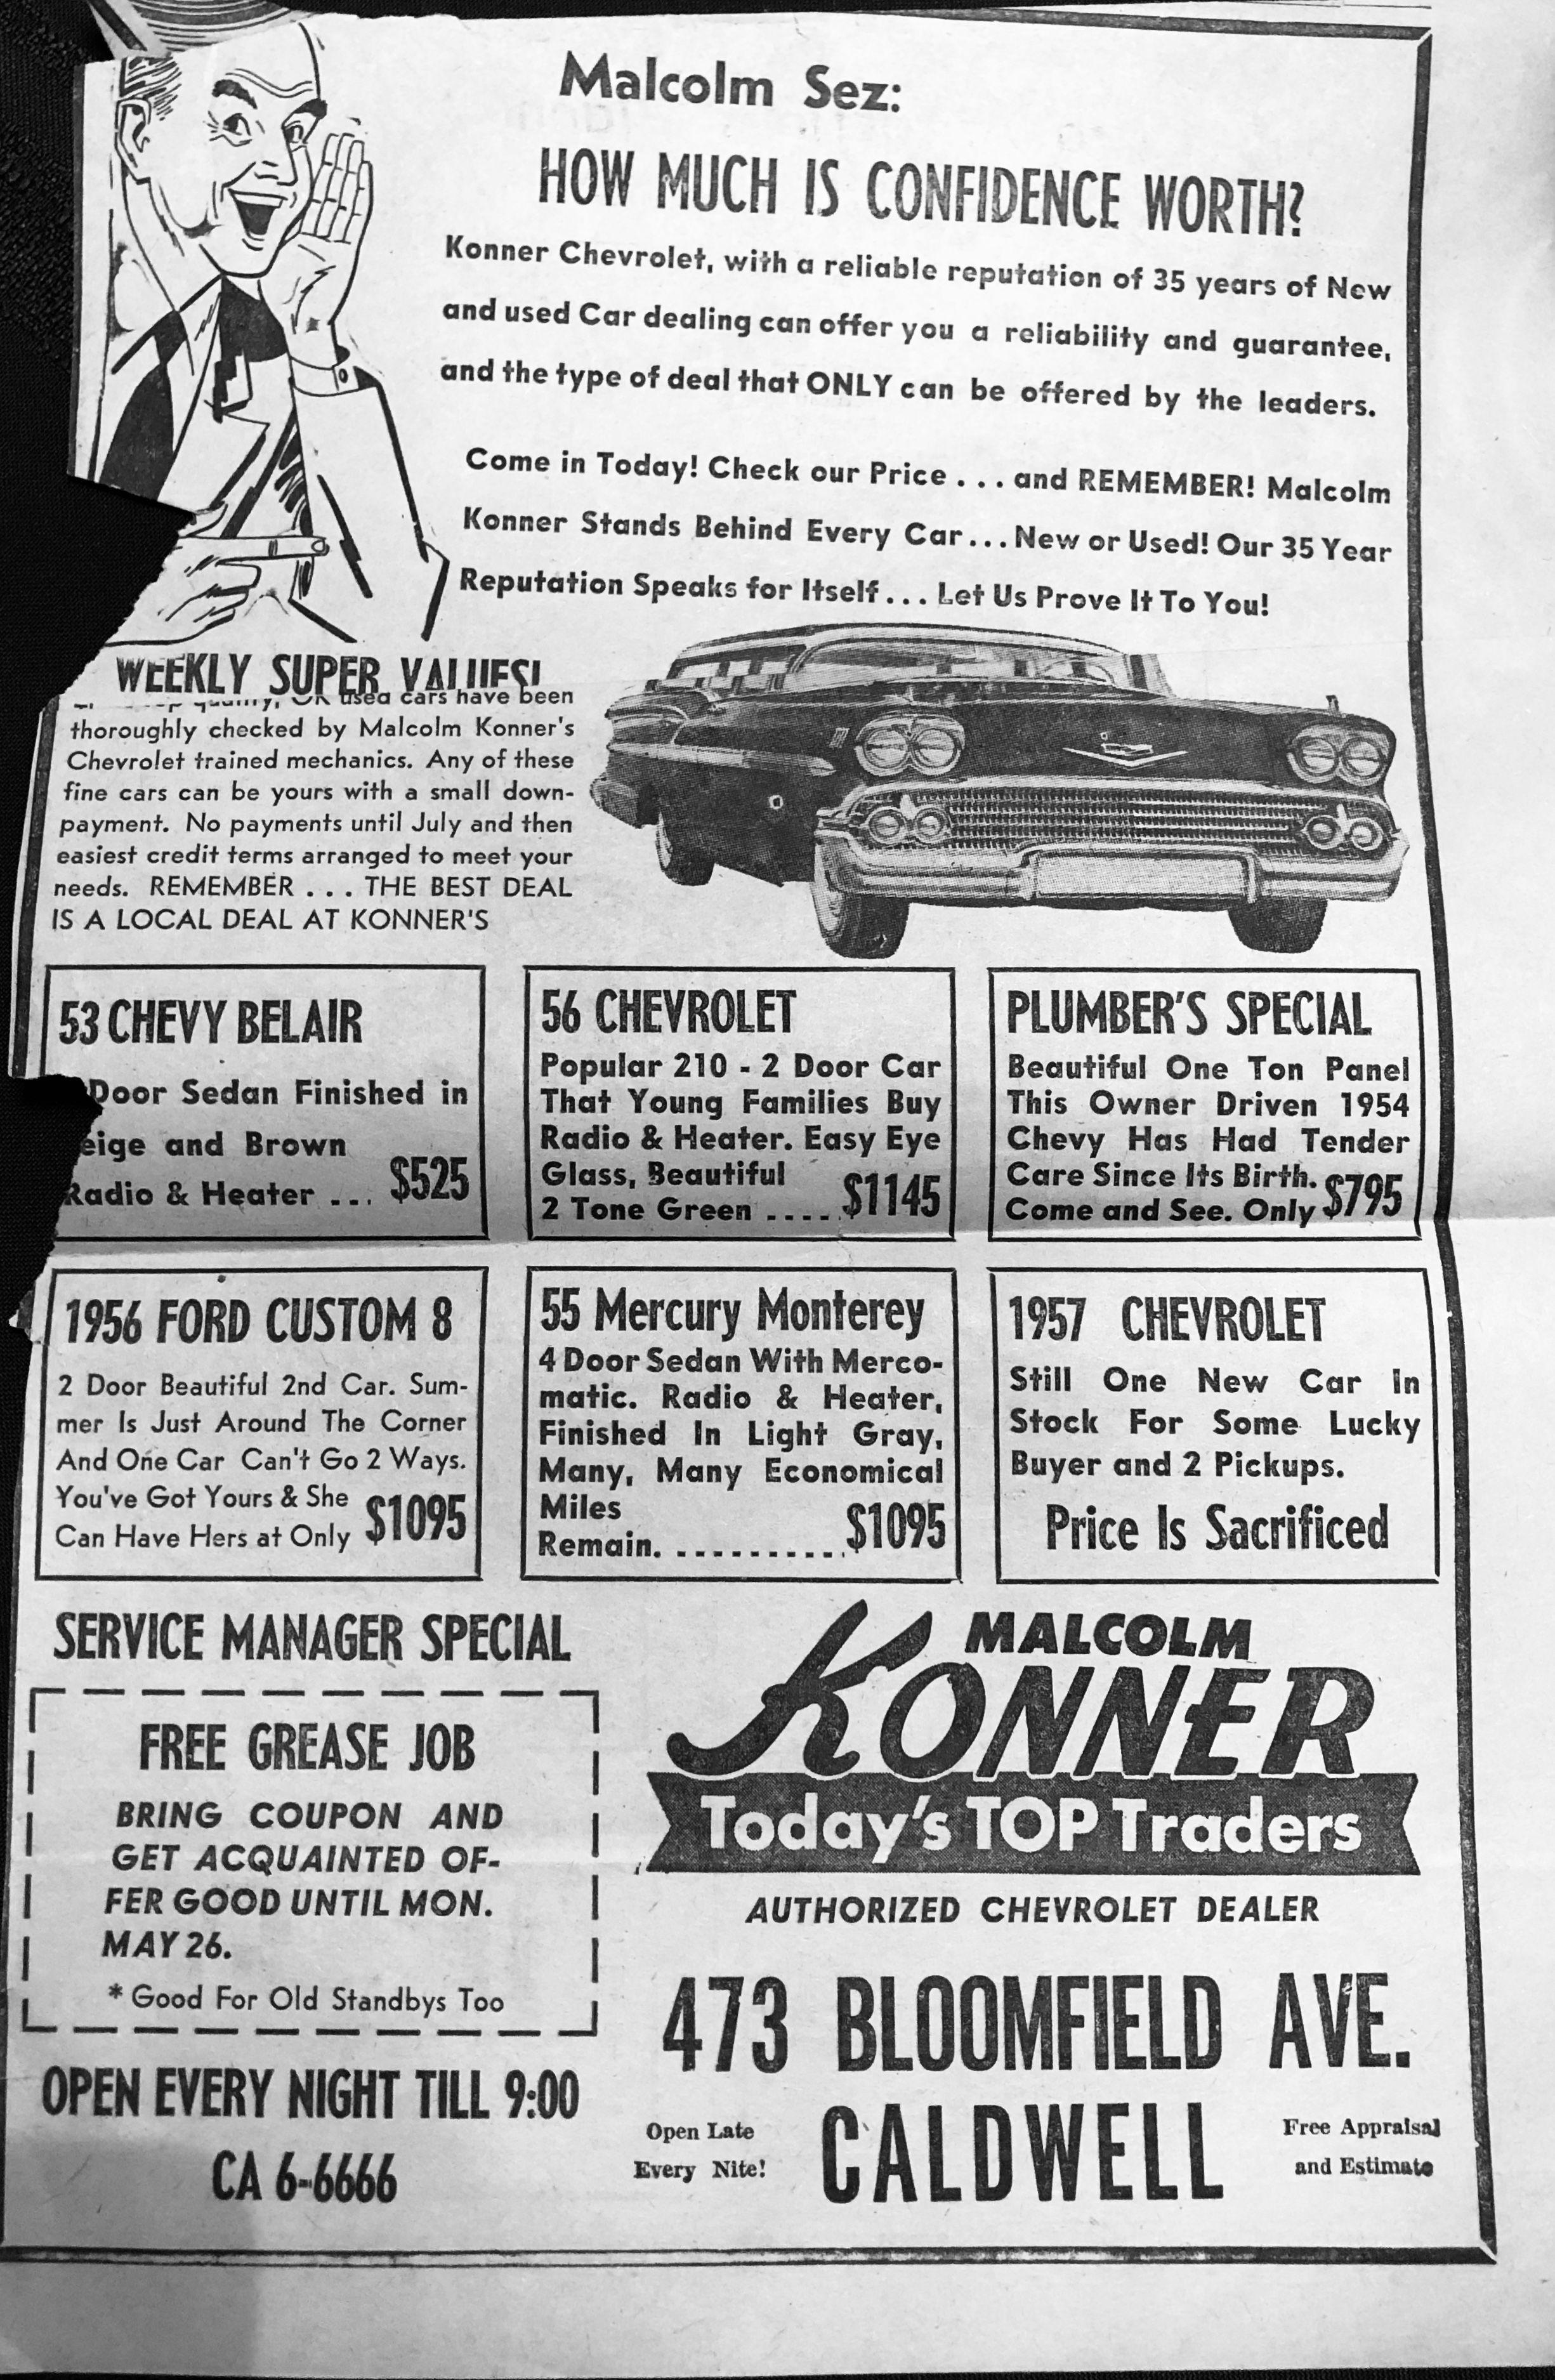 A Malcolm Konner Chevrolet Adv 1958 Car Advertising Car Ads Vintage Cars